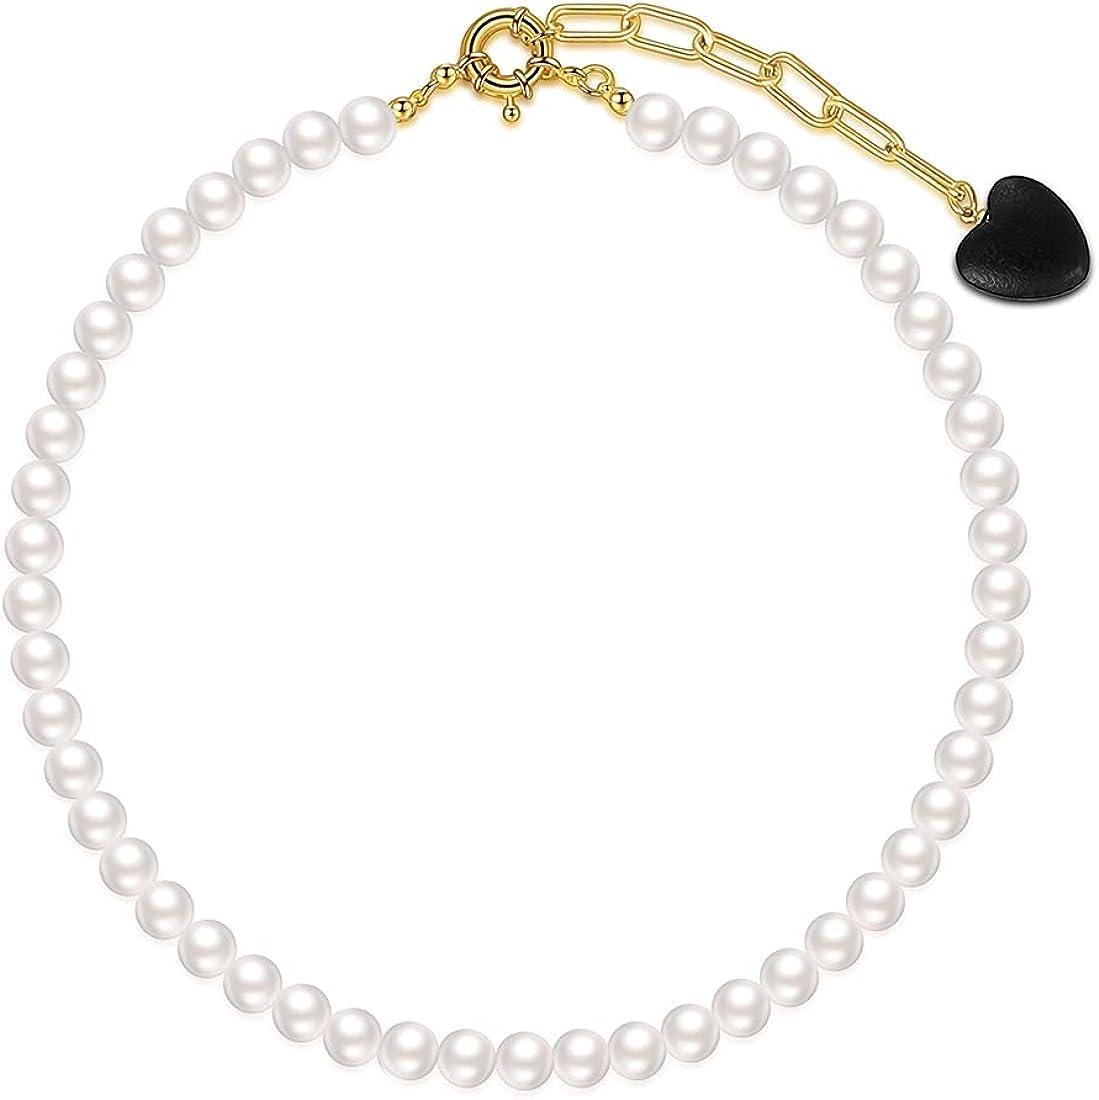 ABOJOY Dainty Gold Layered Choker Necklace, Pendant Handmade Arrow Bar Layering Long Necklace for Women,Girls